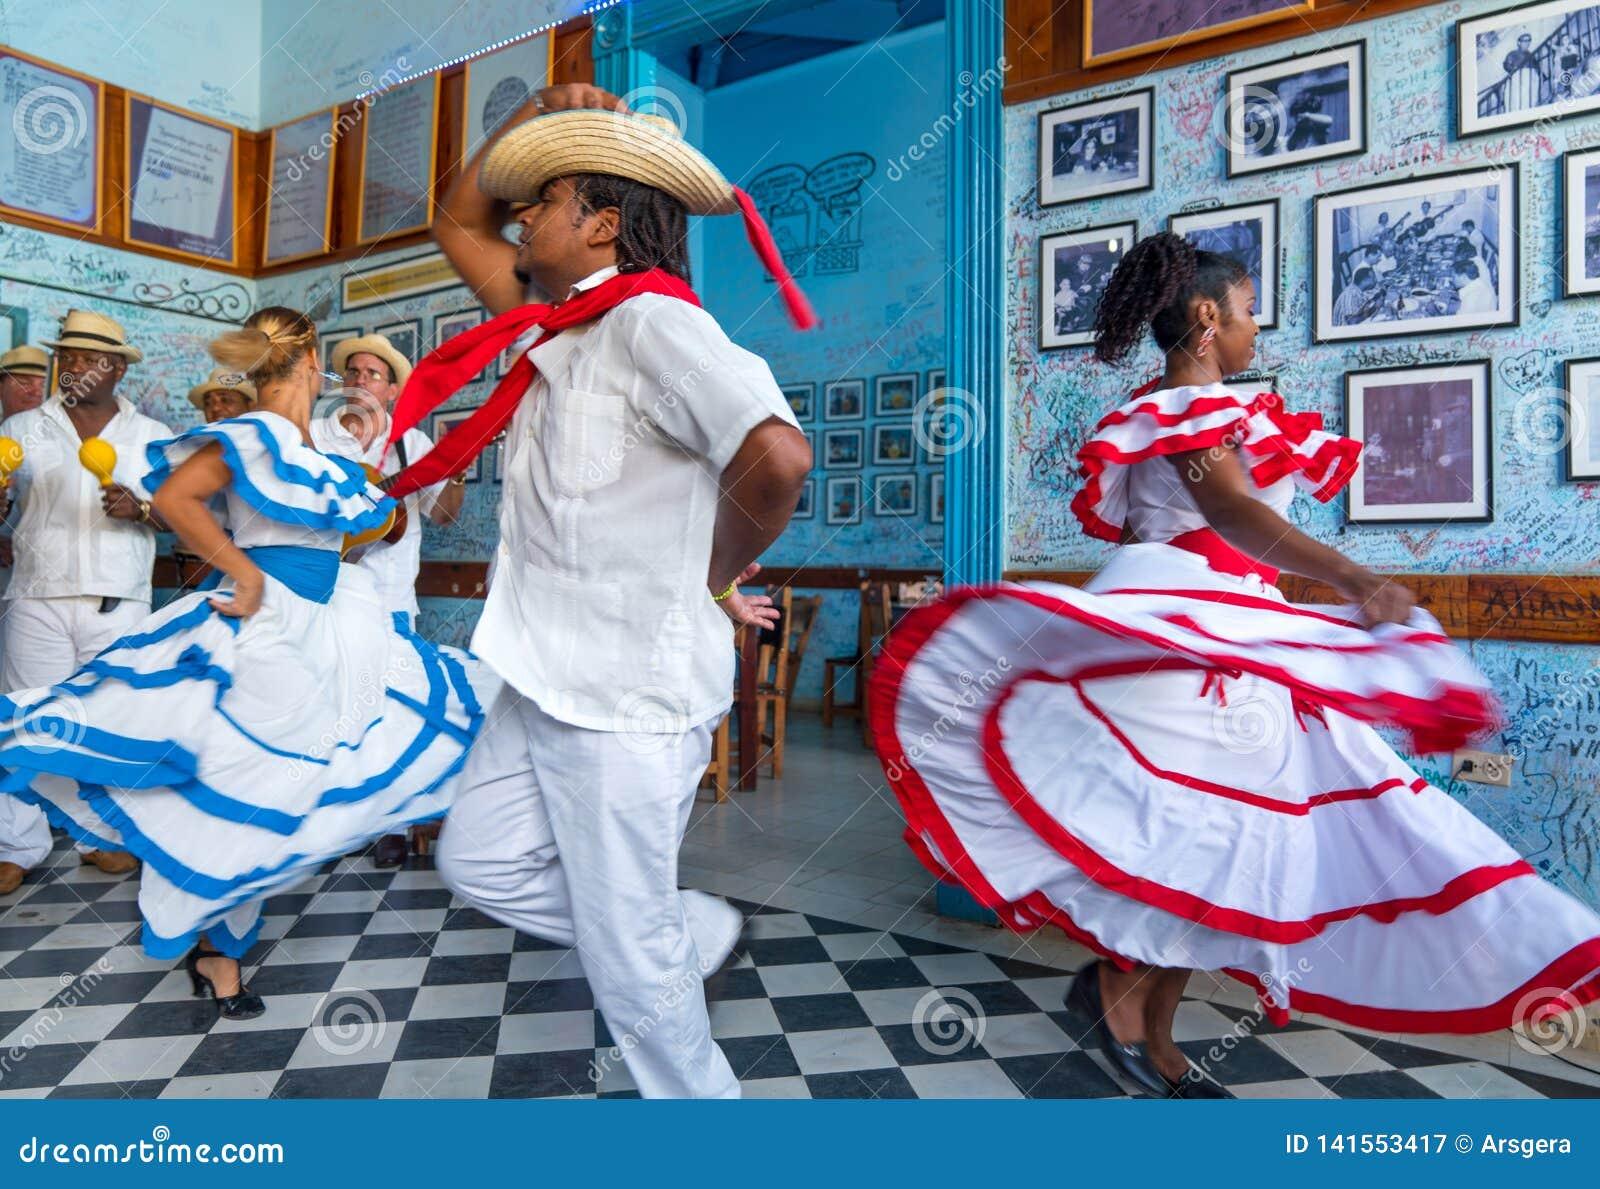 Dancers and musicians perform cuban folk dance